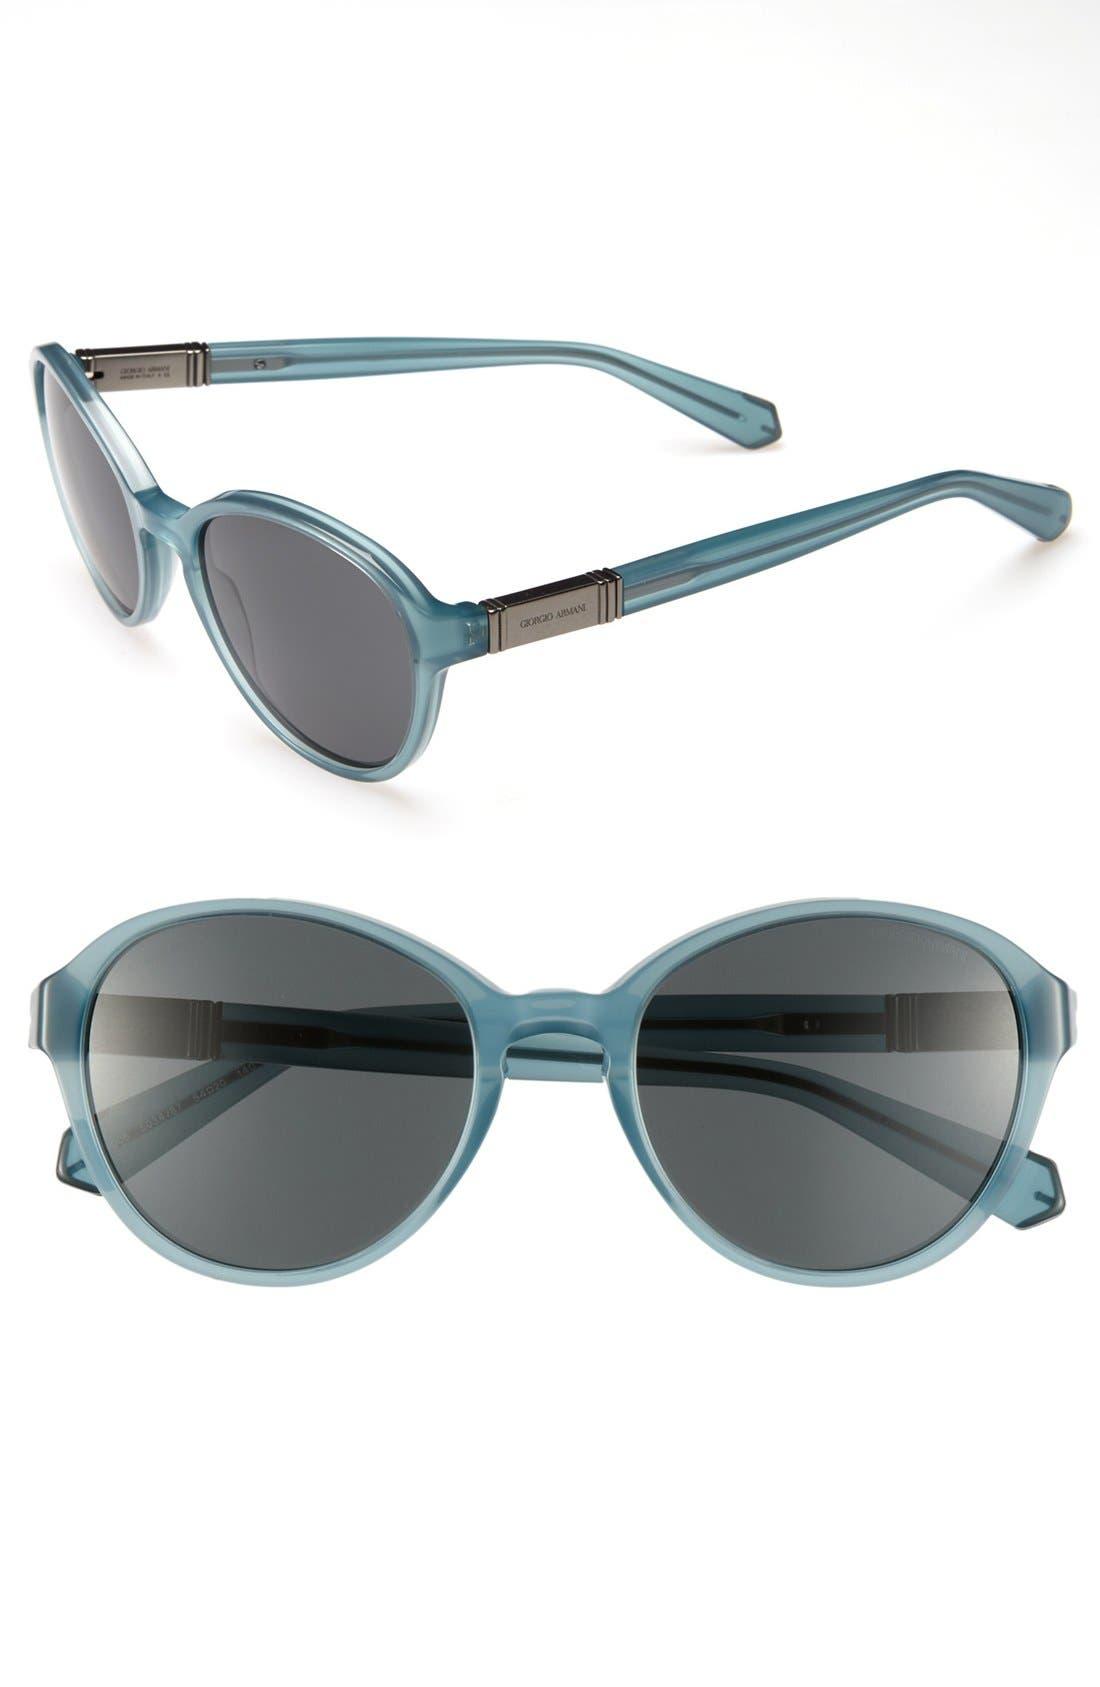 Main Image - Giorgio Armani 54mm Round Sunglasses